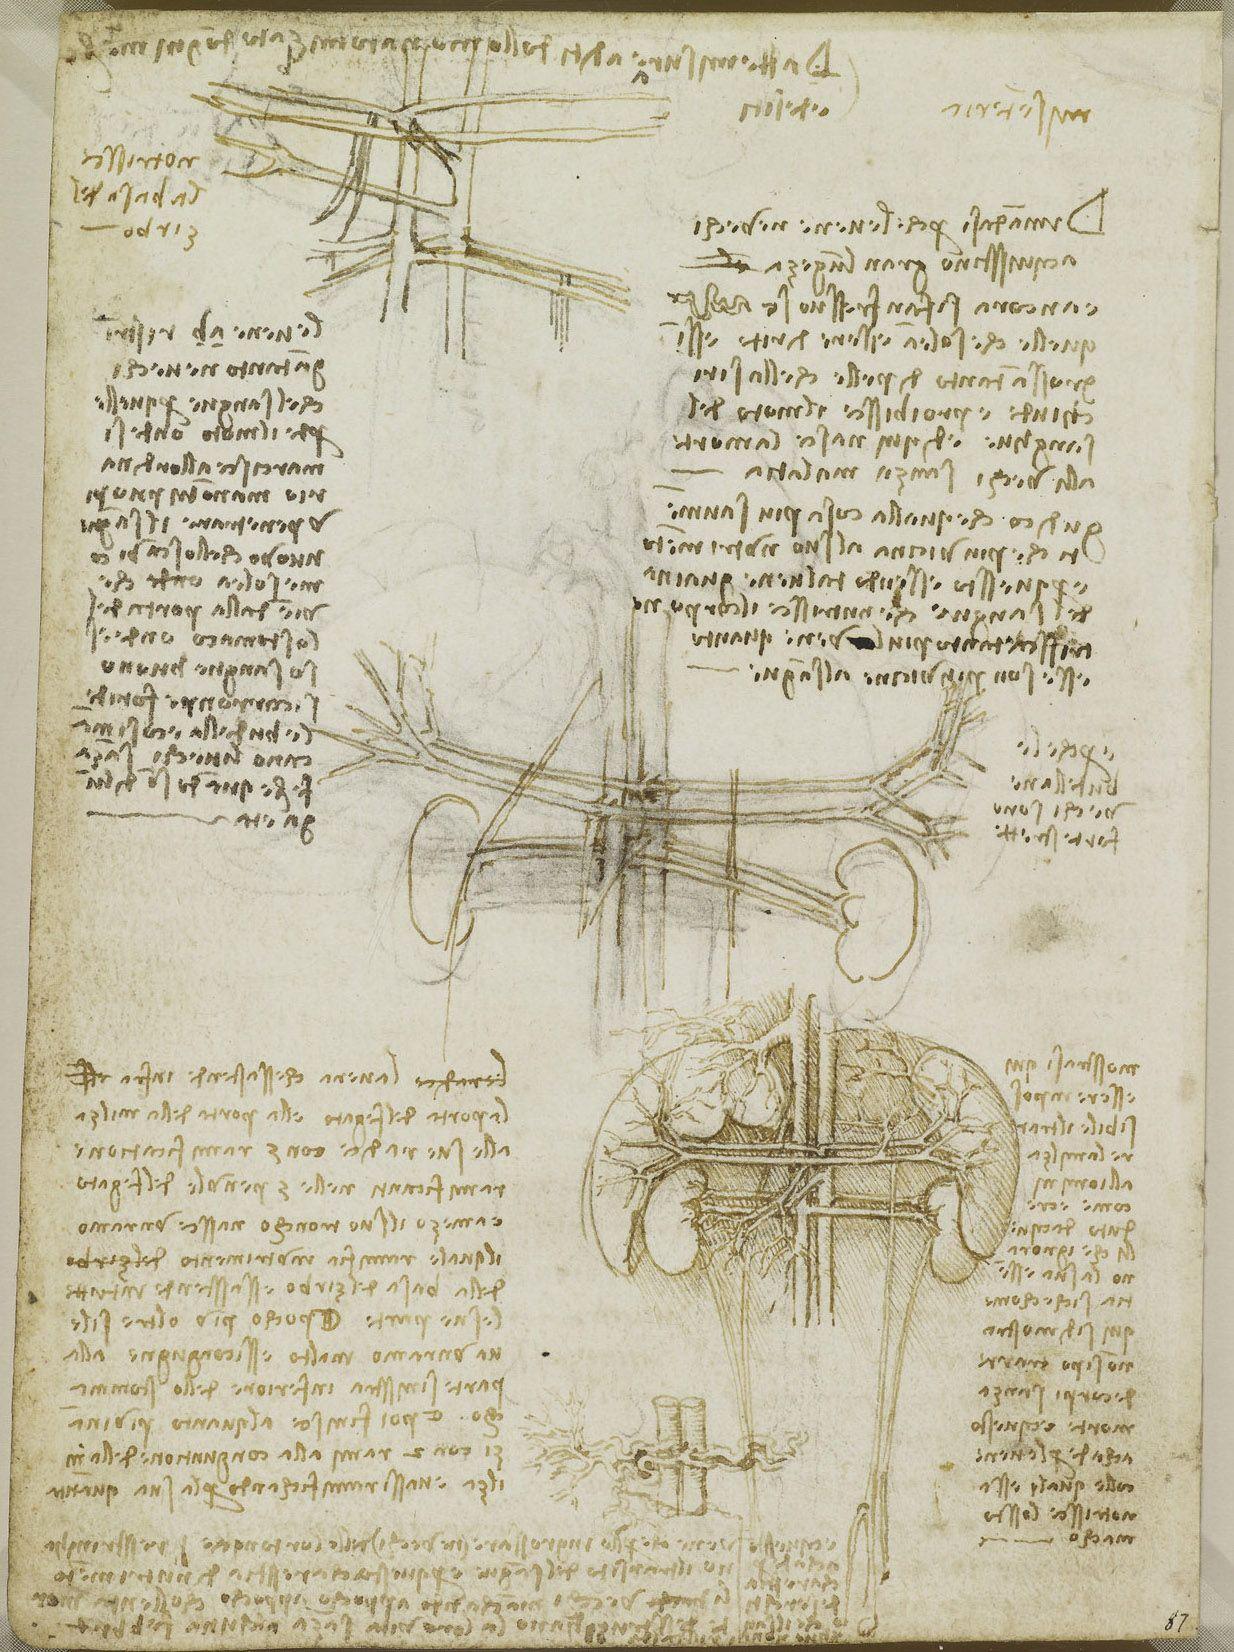 resume Leonardo Da Vinci Resume the heart compared to a seed leonardo da vinci 1452 amboise 1519